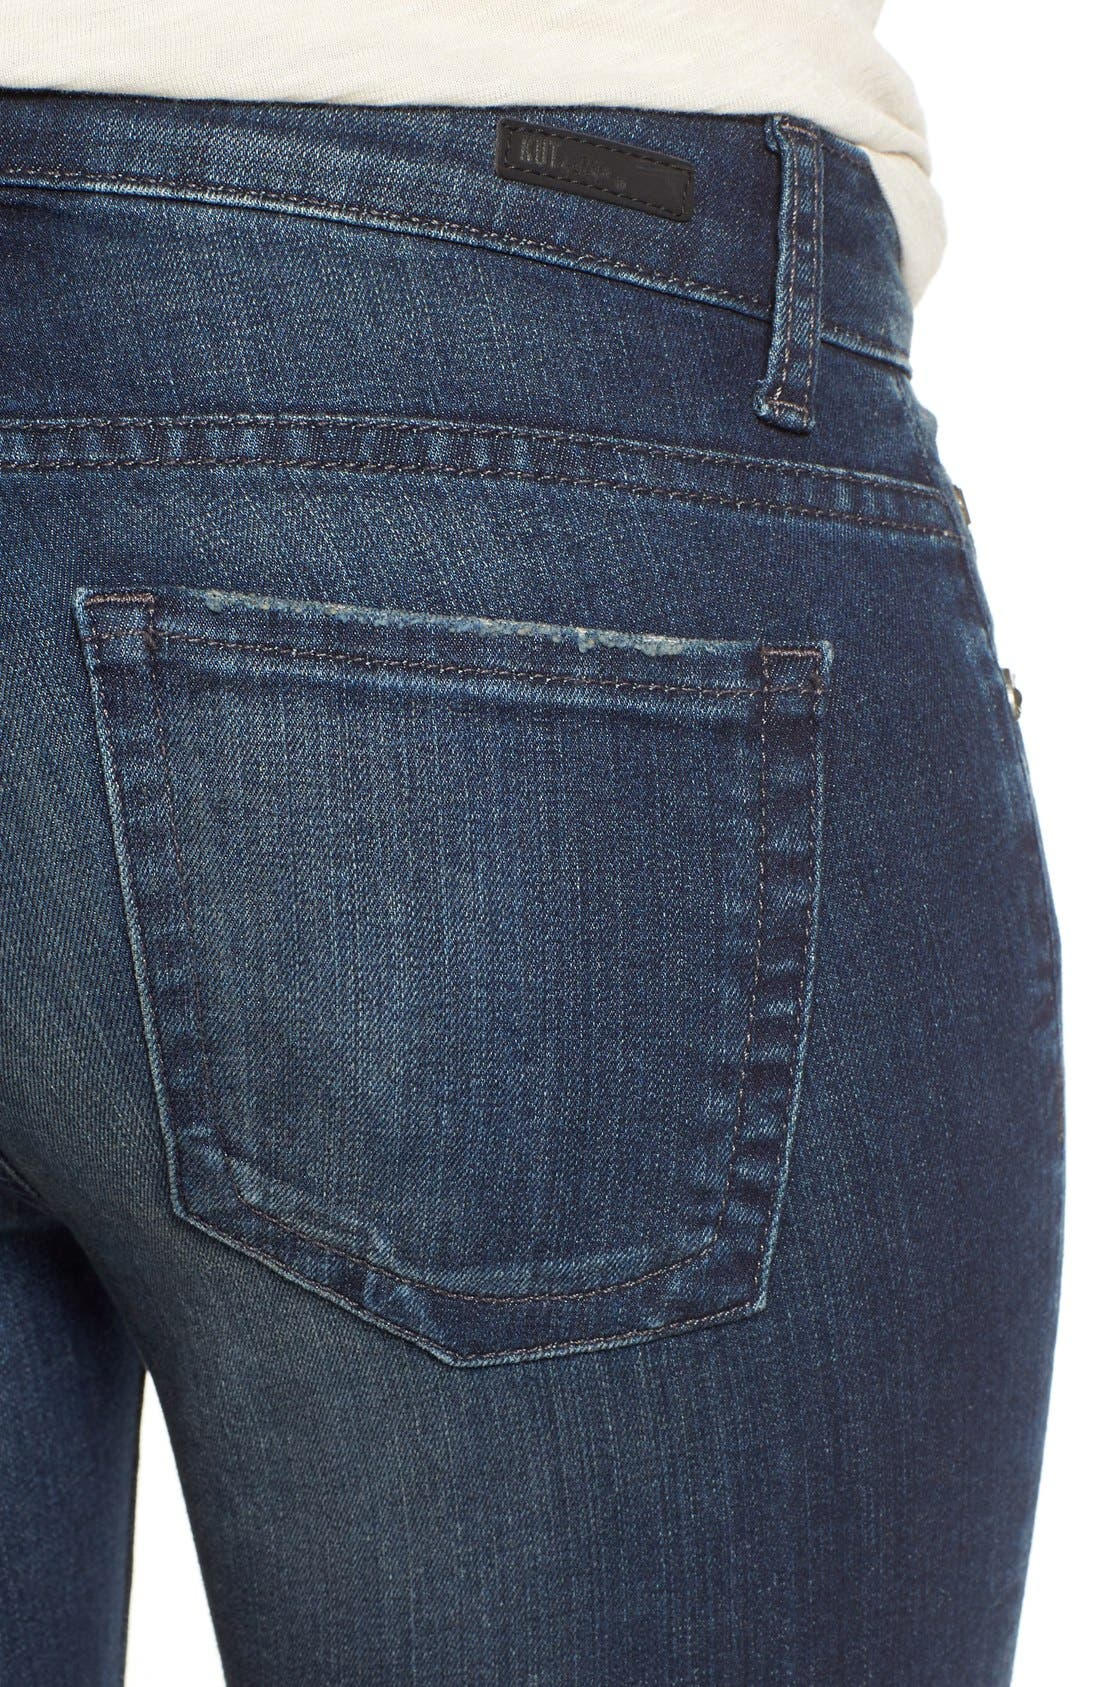 Alternate Image 4  - Kut from the Kloth 'Catherine' Slim Boyfriend Jeans (Carefulness) (Regular & Petite)